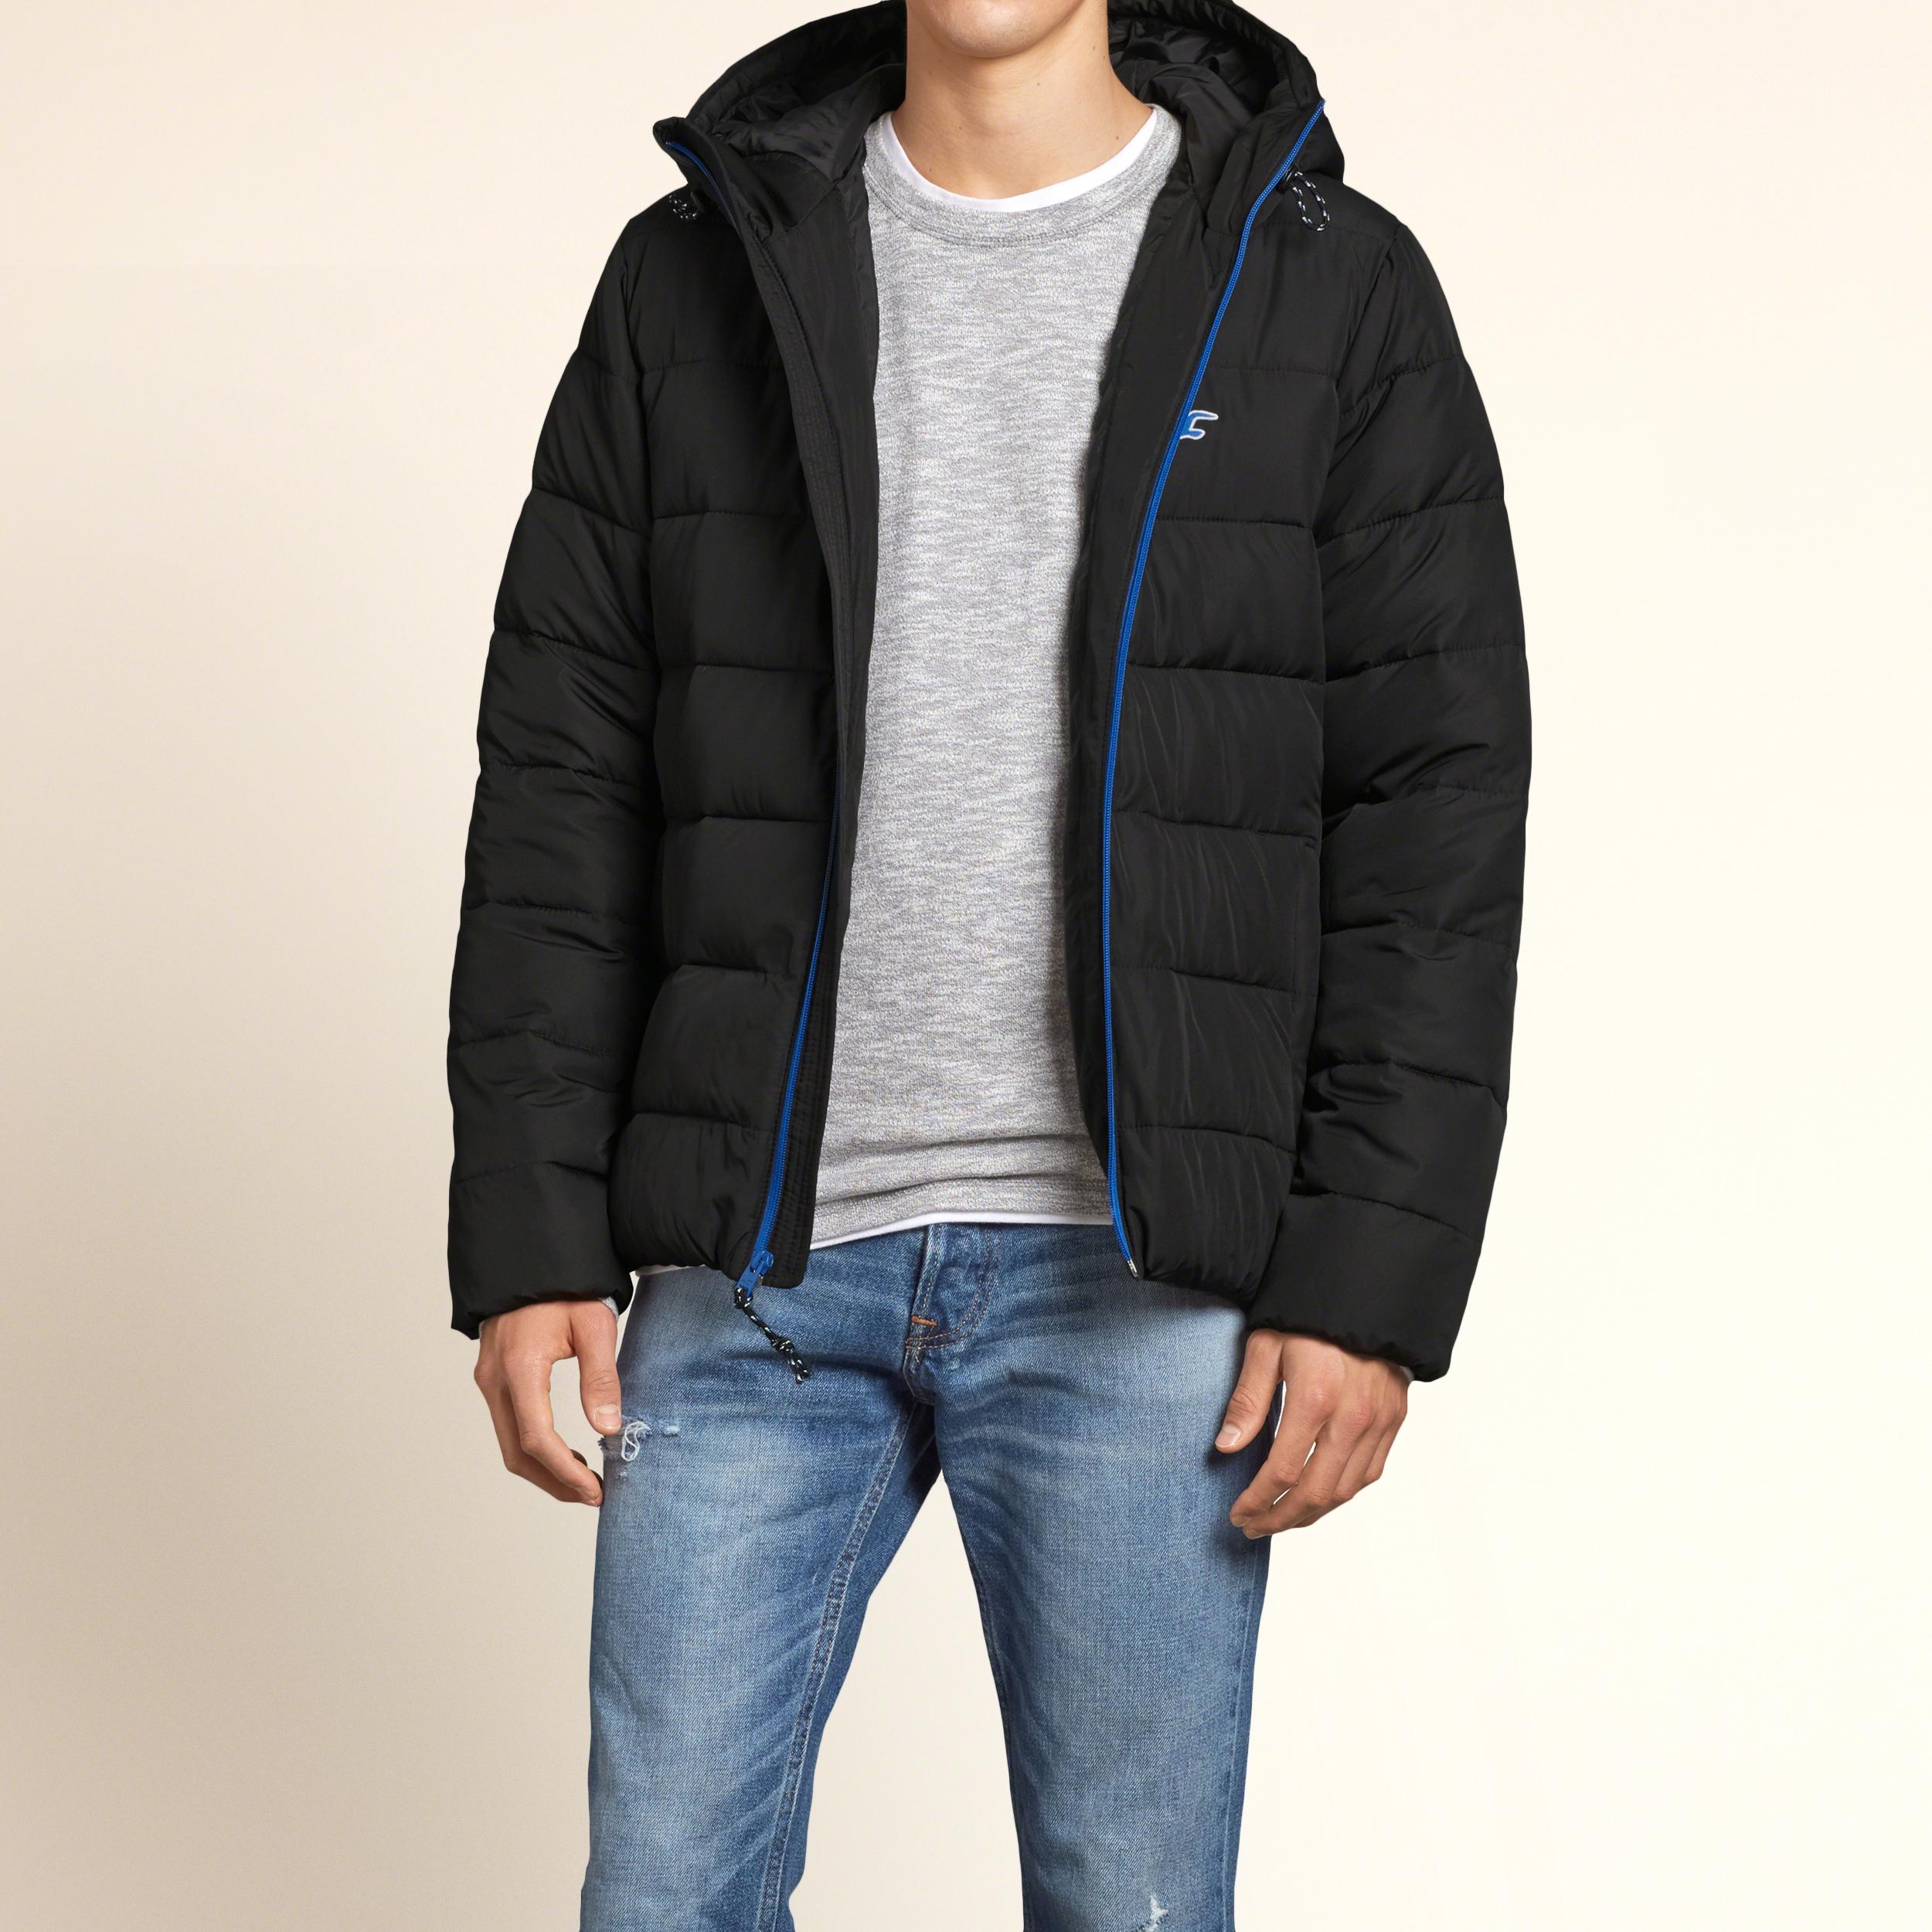 lyst hollister hooded puffer jacket in black for men